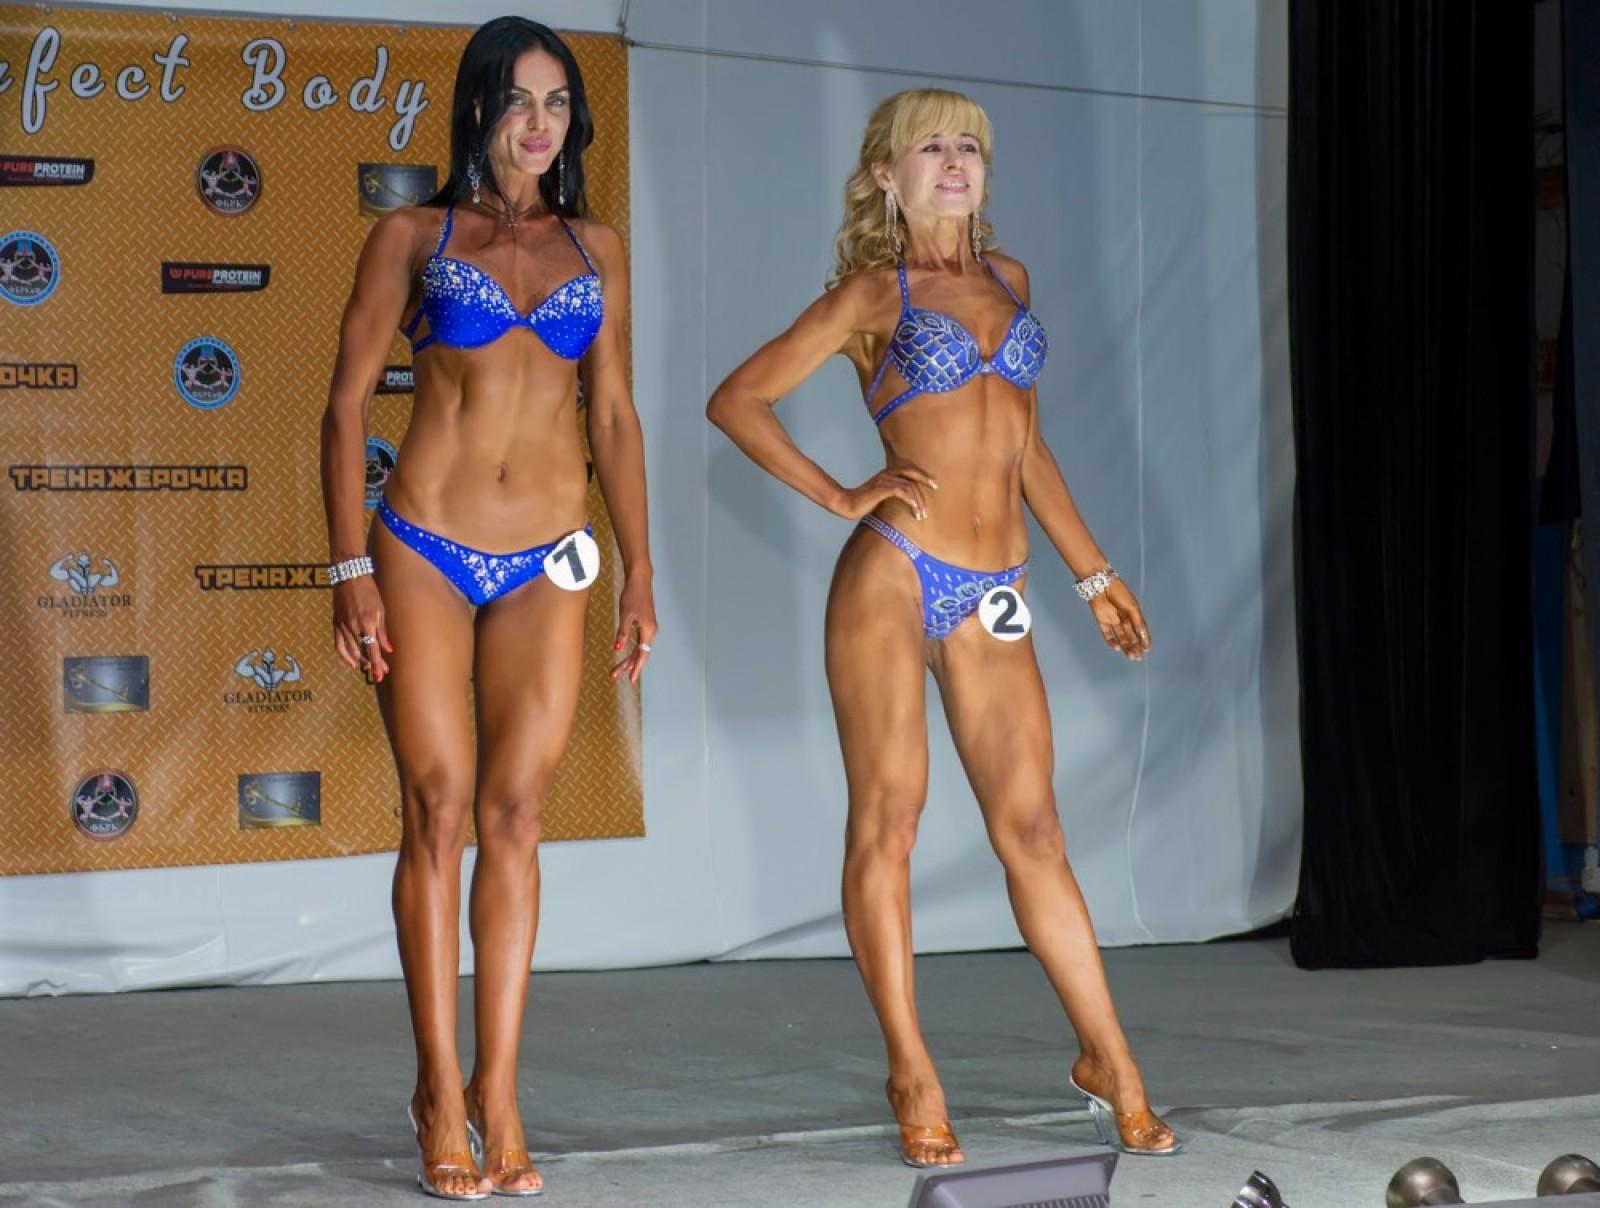 Как проходит конкурс фитнес бикини 5